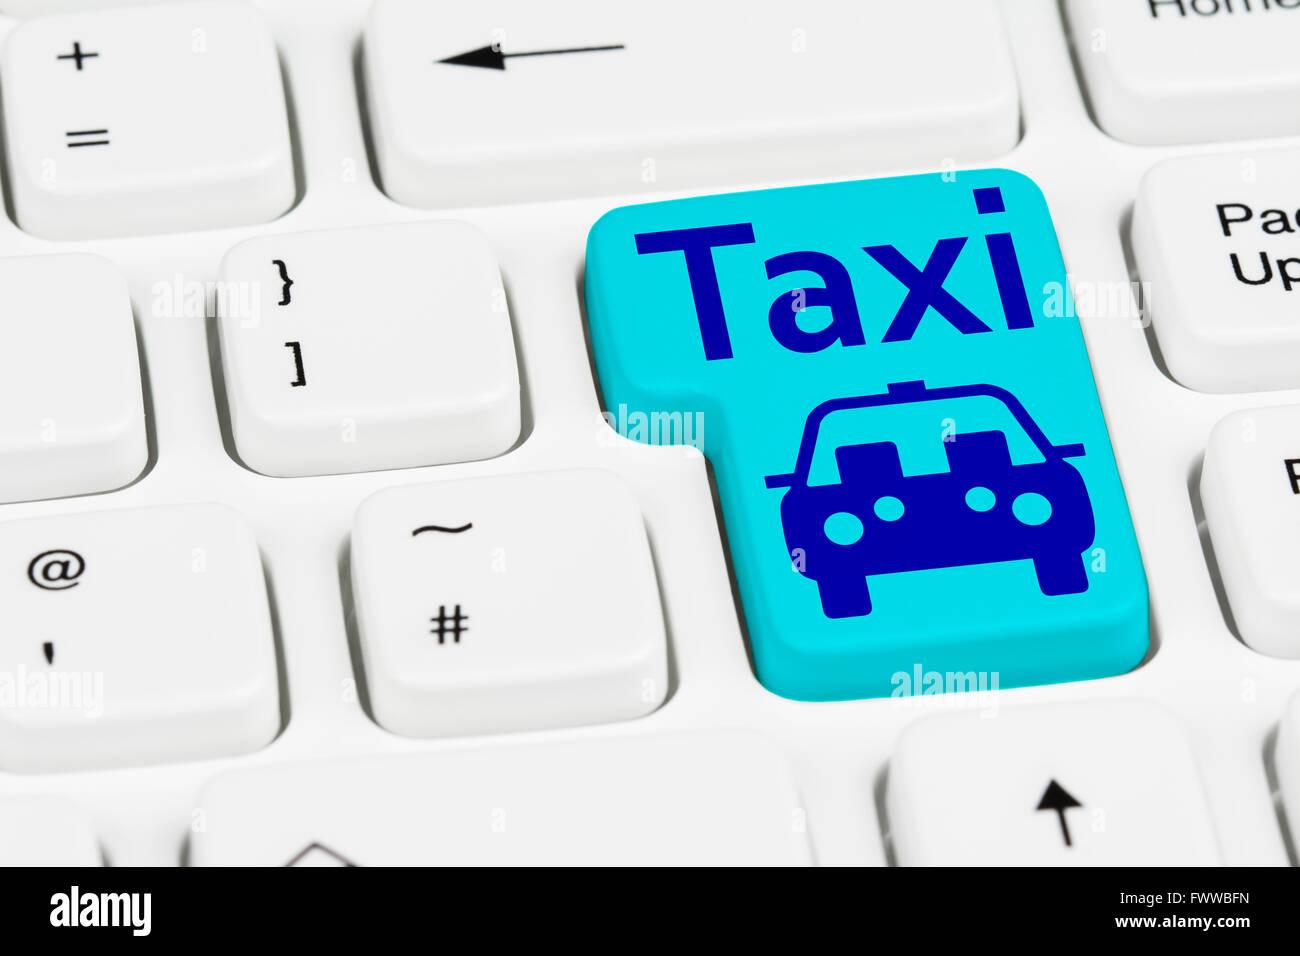 Botón de taxi en un teclado de ordenador. Imagen De Stock